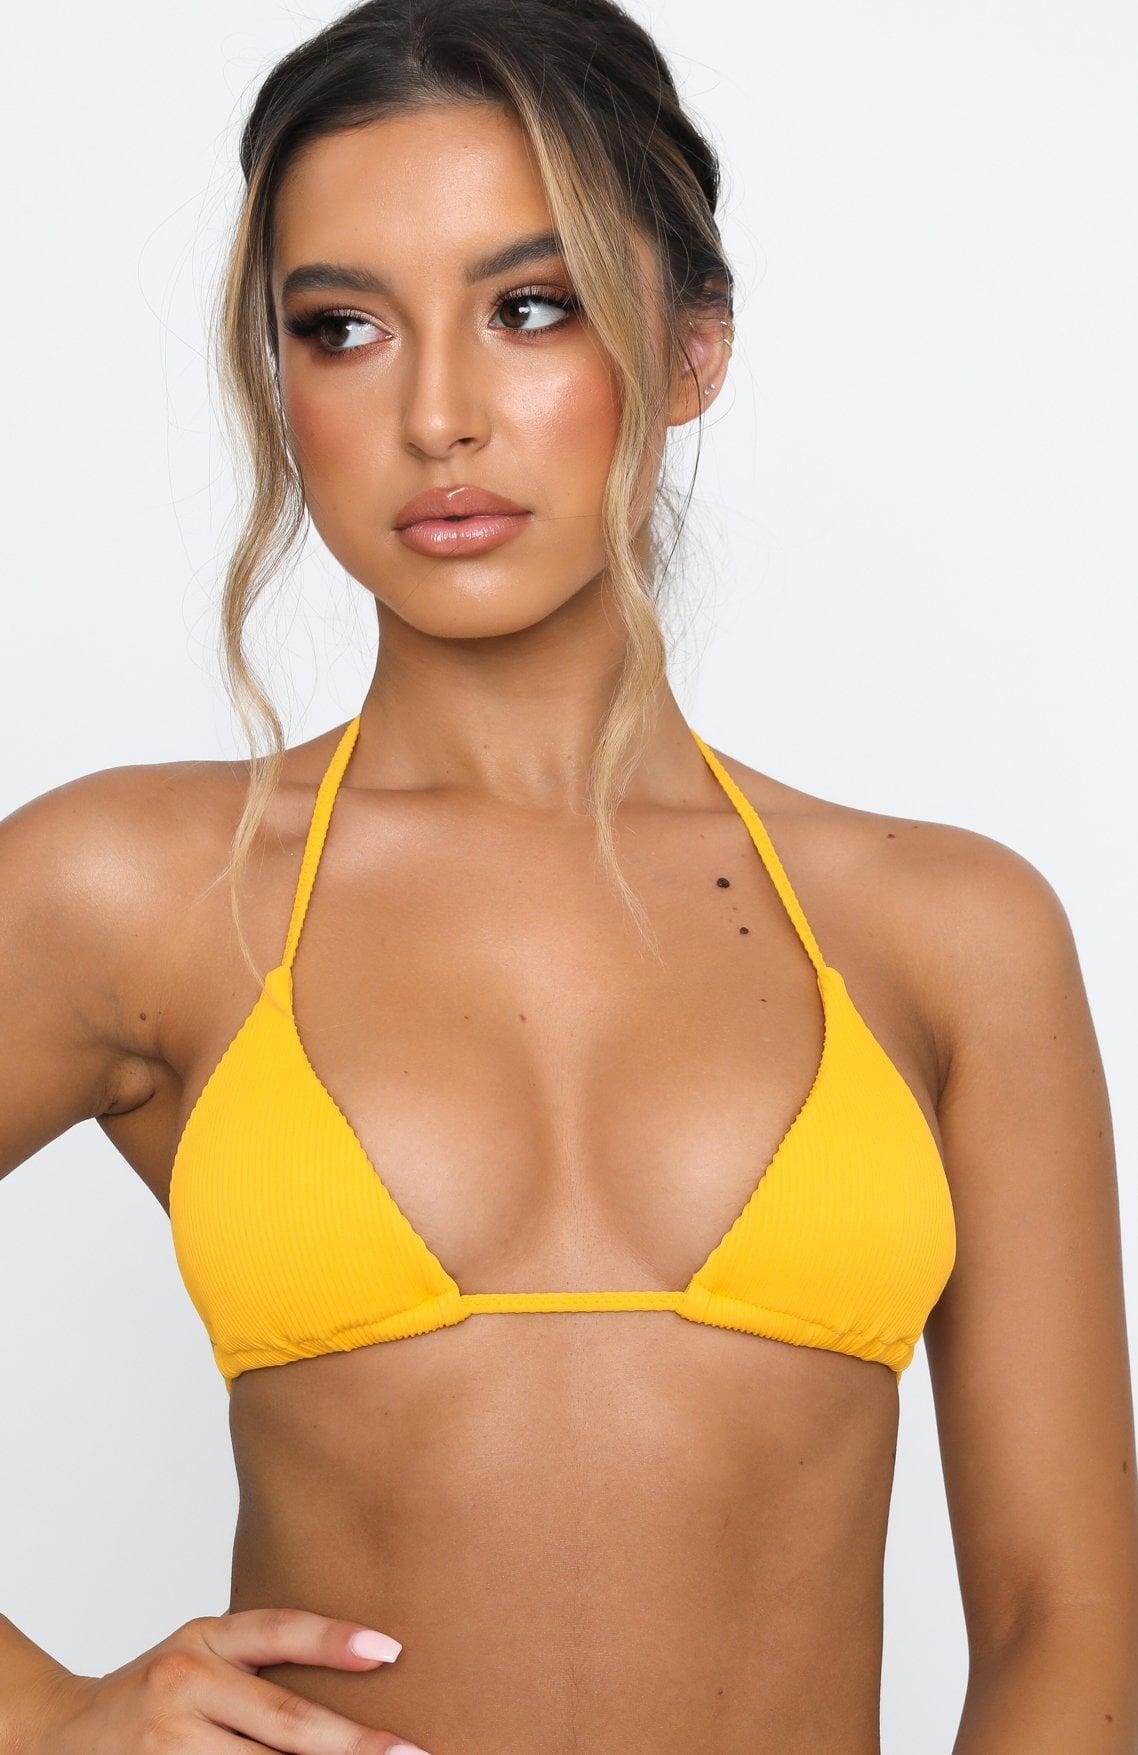 Outfit bikini ariana grande Ariana Grande